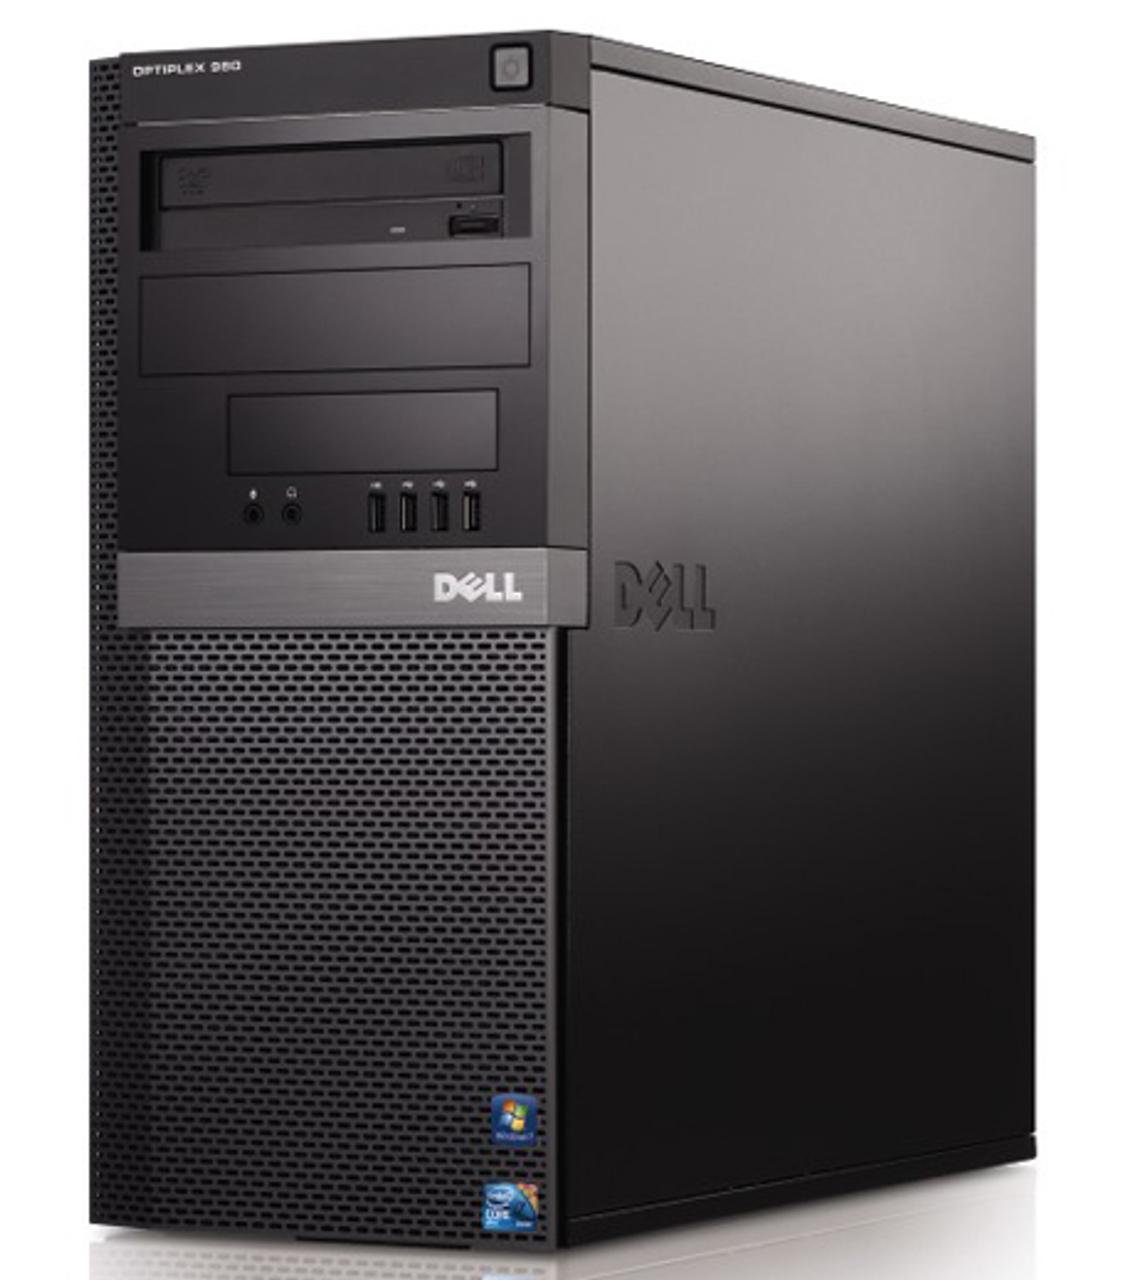 Dell Optiplex 980 Tower Core i5 3.2GHz, 4GB Ram, 250GB HDD, DVD-RW, Windows 10 Pro 64 Desktop Computer